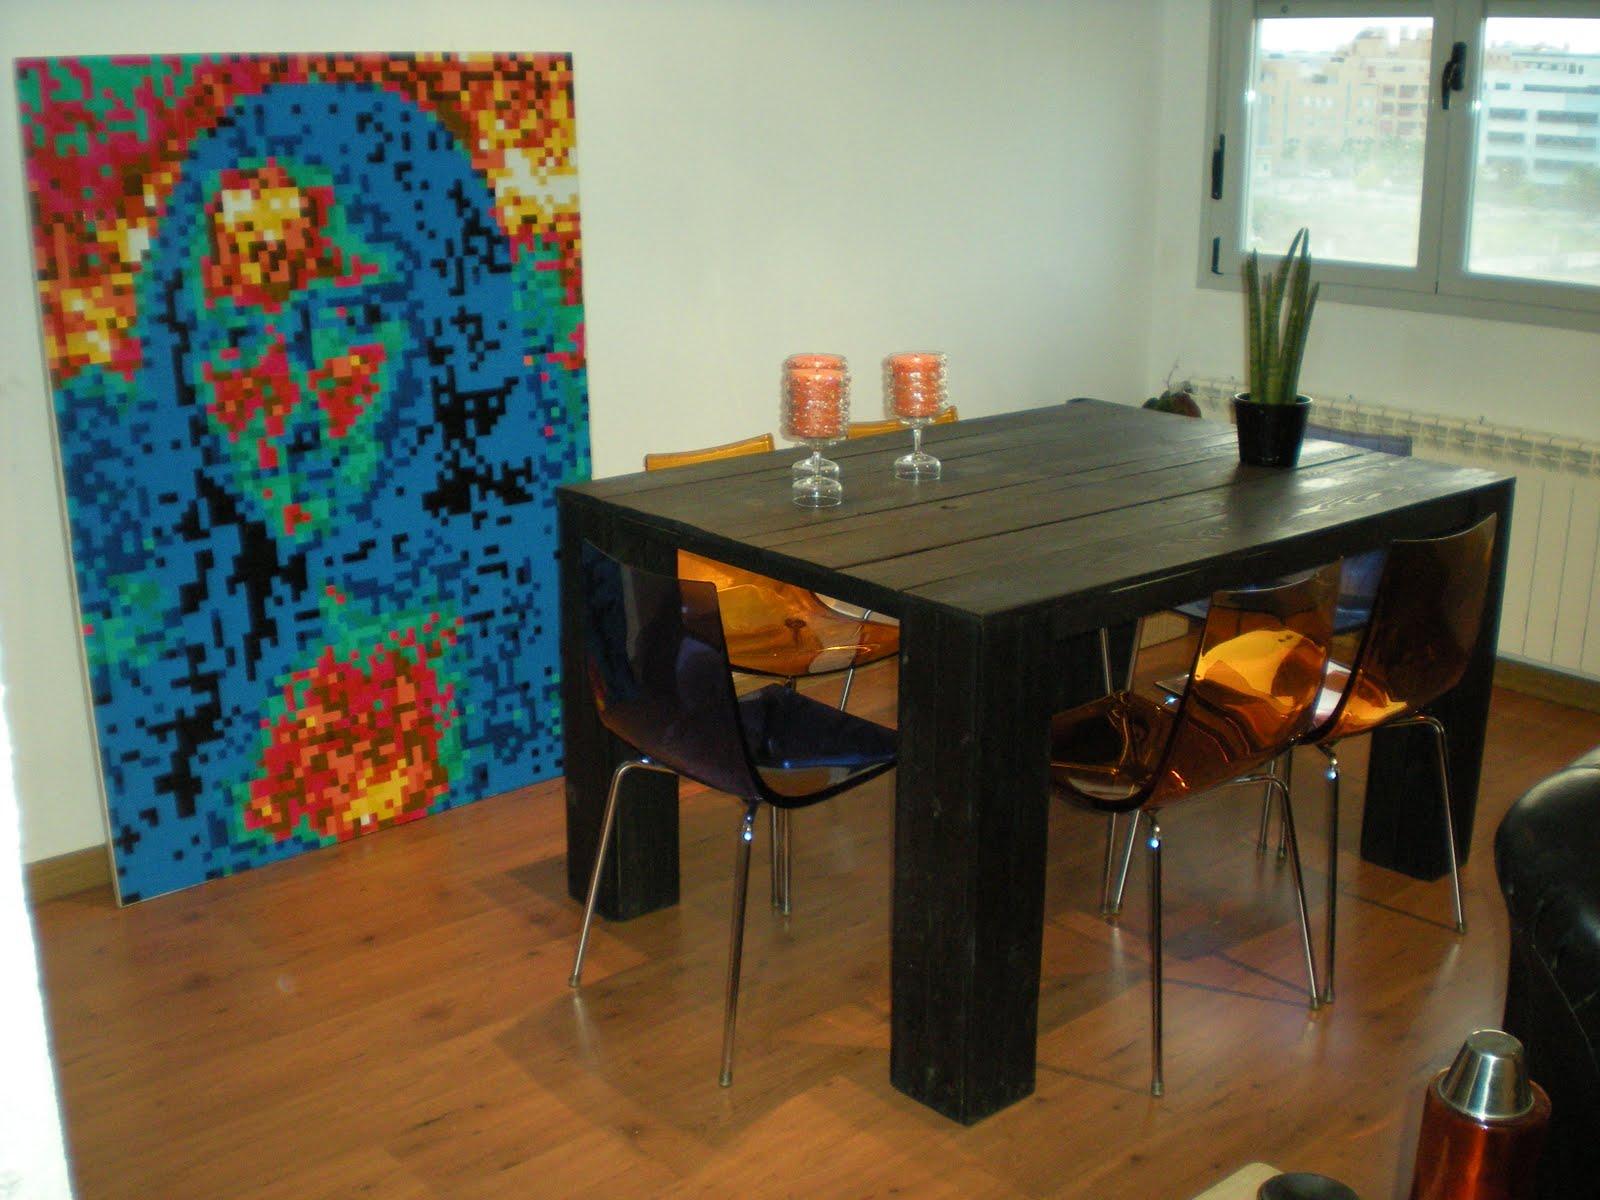 Economic creativity mesa de madera reciclada - Mesas madera reciclada ...